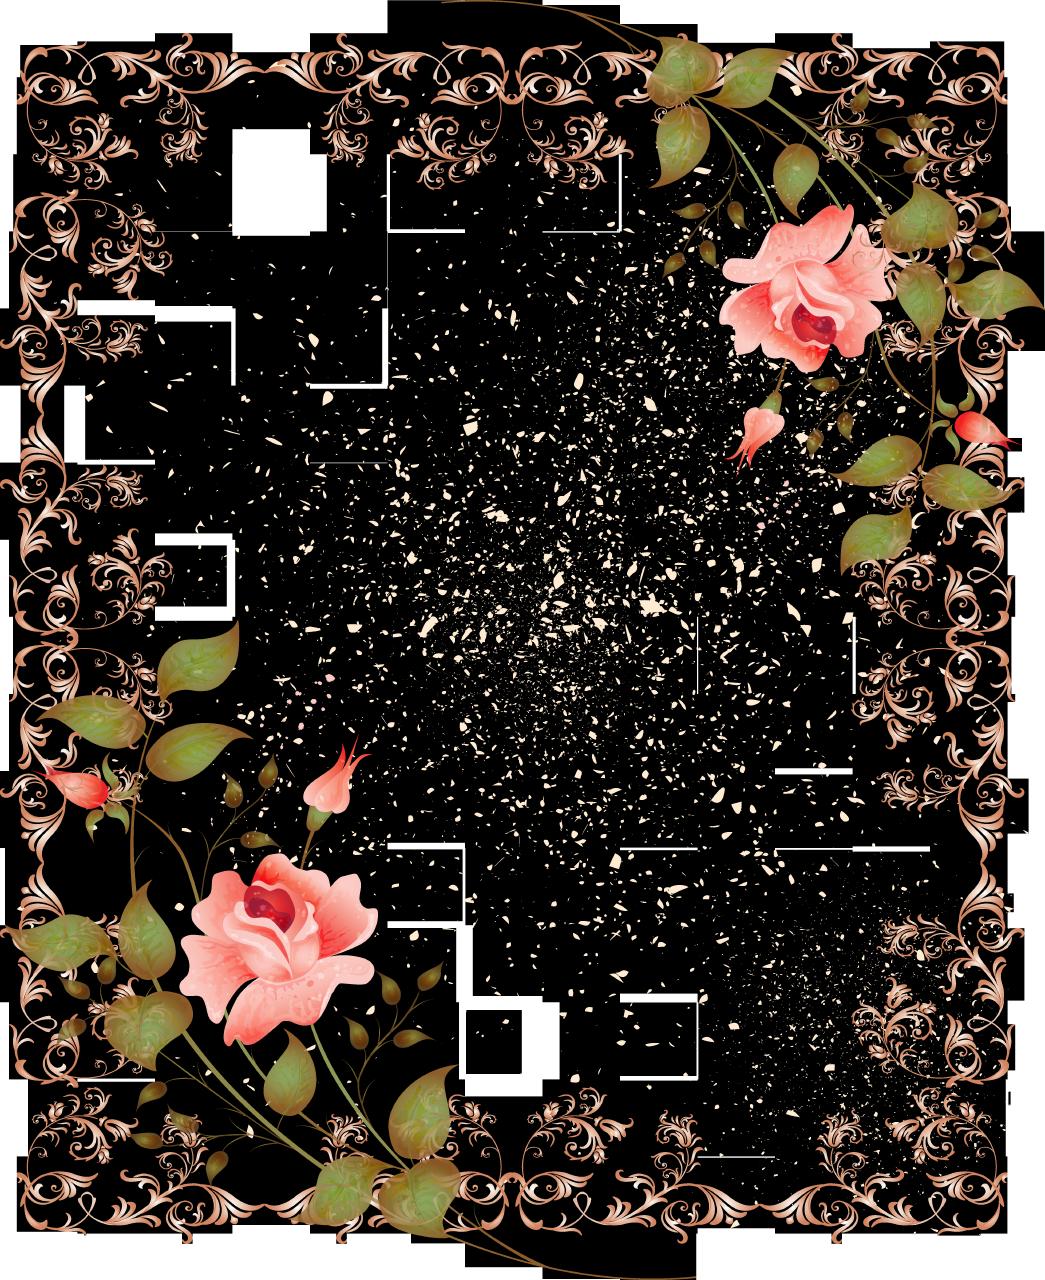 retrostylefloralborderpictureframepng 10452151280